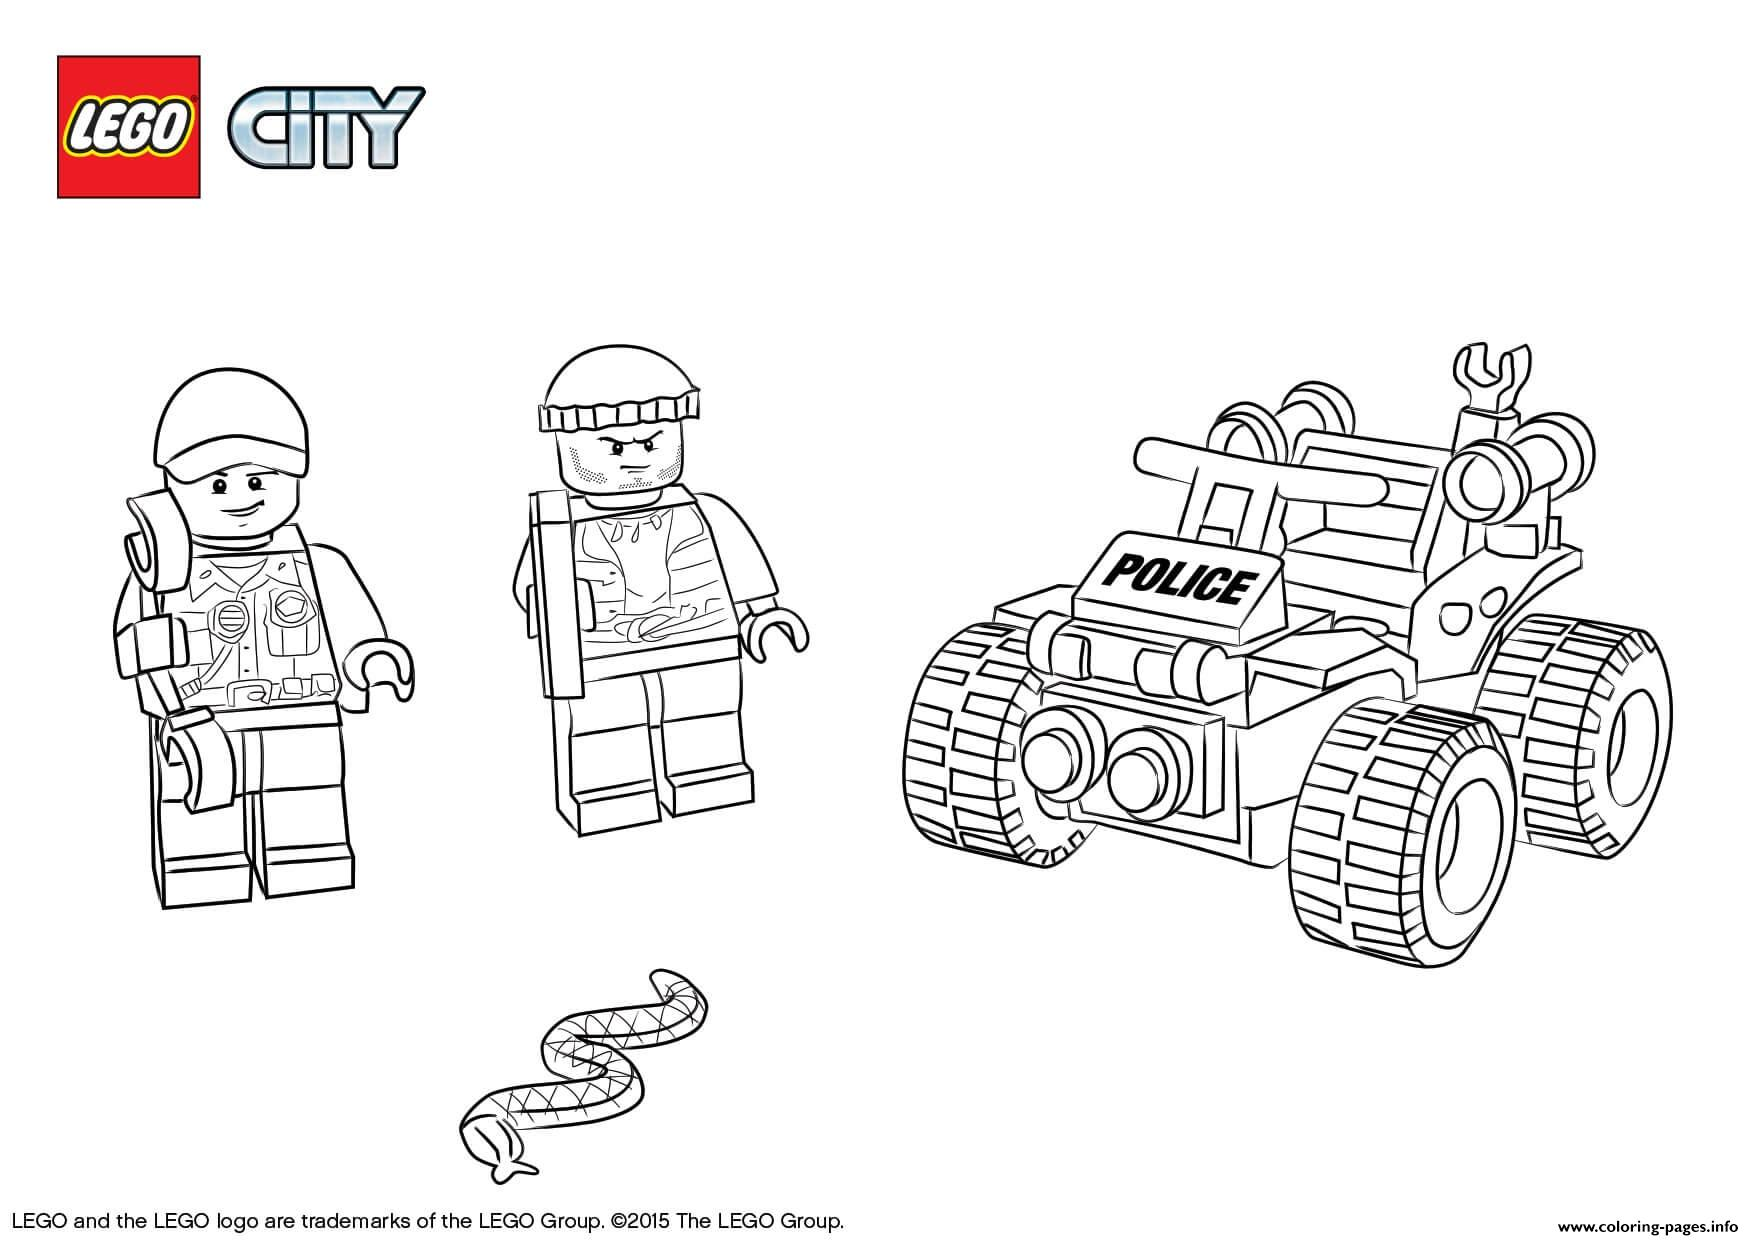 Lego City Atv Patrol Police Coloring Pages Printable